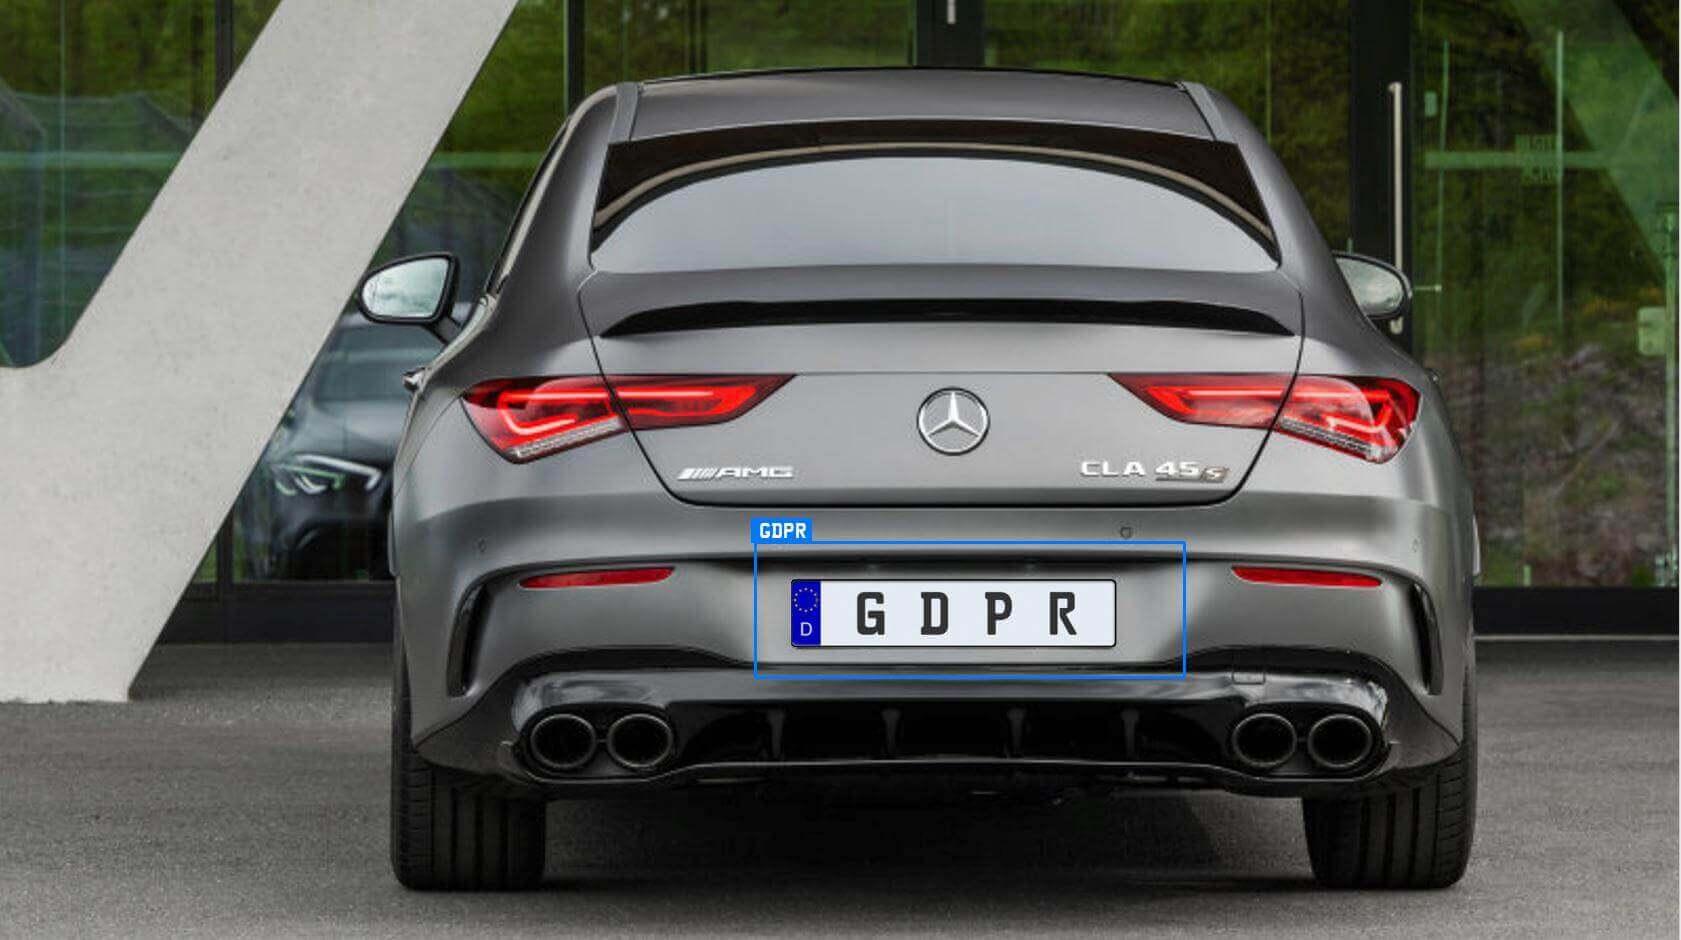 ANPR GDPR Number Plate Recognition